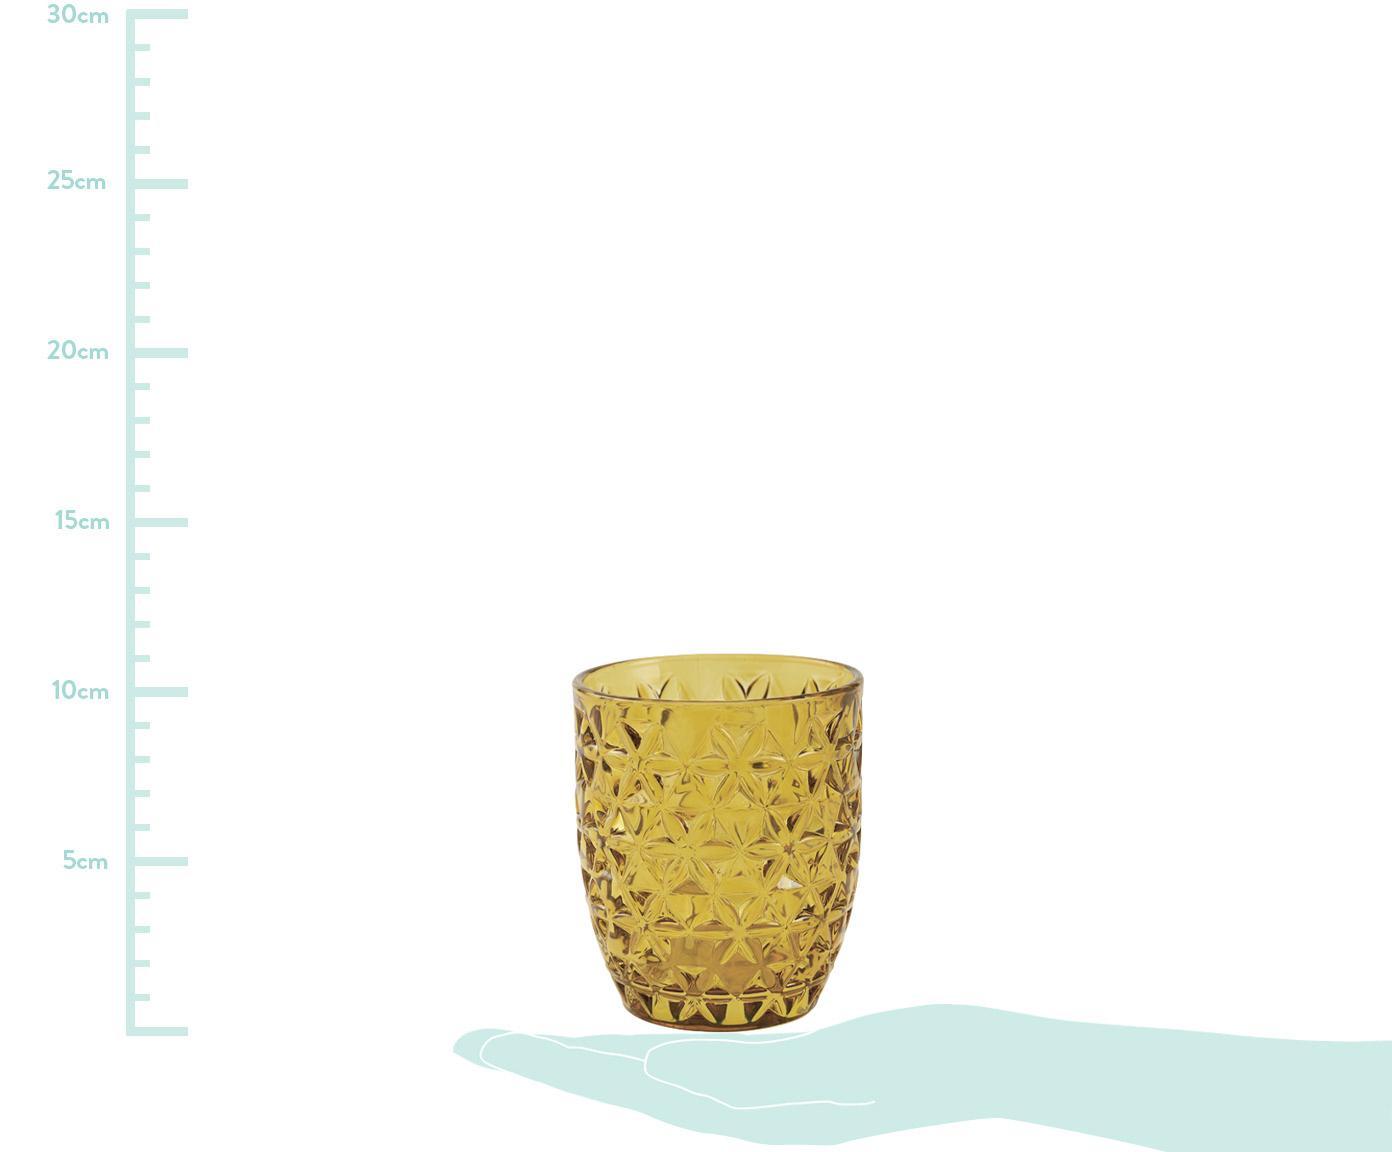 Vasos de colores con relive Geometrie, 6uds., Vidrio, Azul, verde, gris, rosa, amarillo dorado, transparente, Ø 8 x Al 10 cm